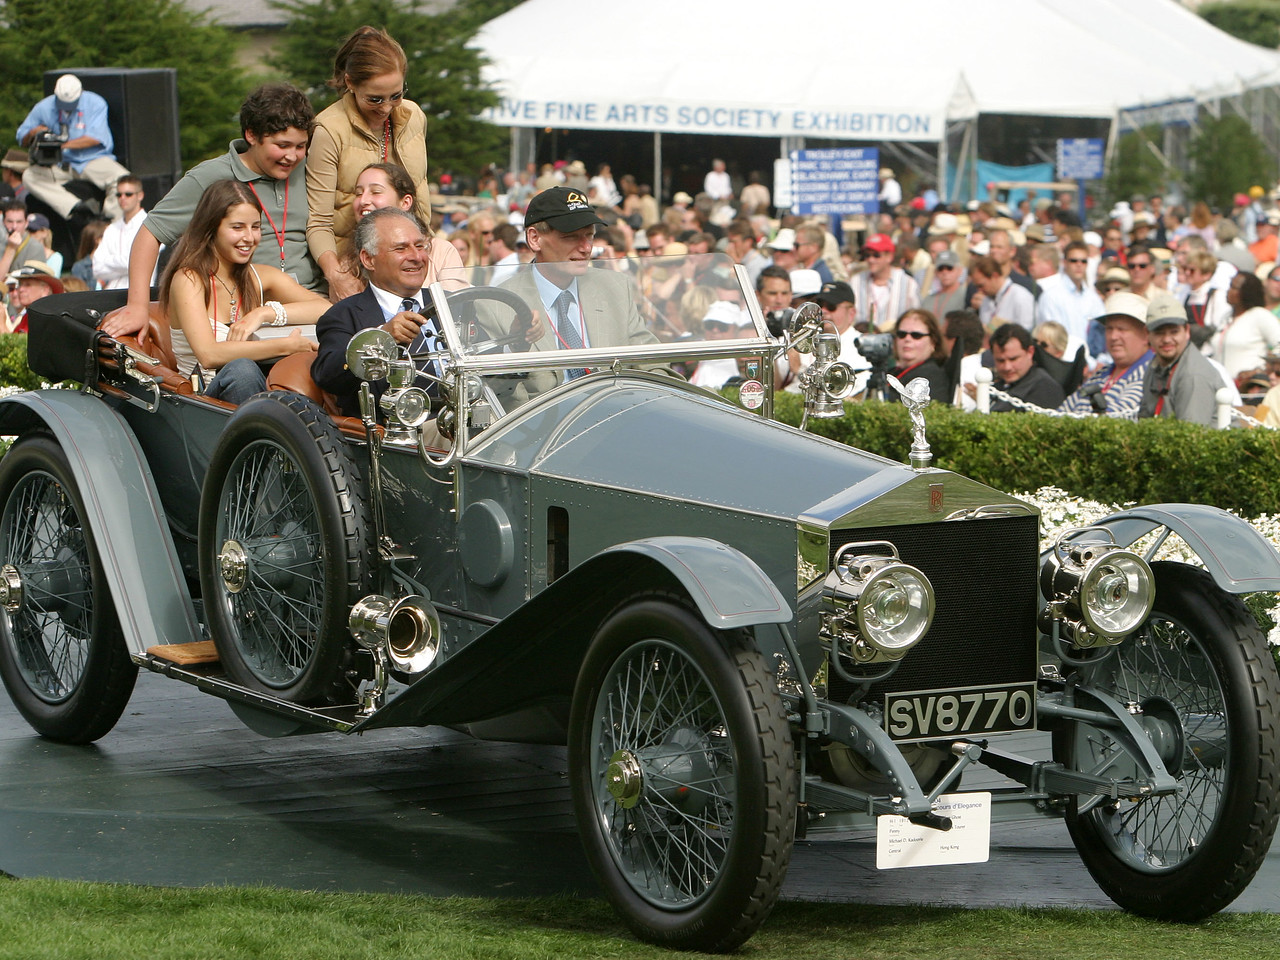 1912 Rolls-Royce Silver Ghost Penny Holmes Tourer.  Most Elegant Open Car Trophy.   Michael D. Kadoorie.